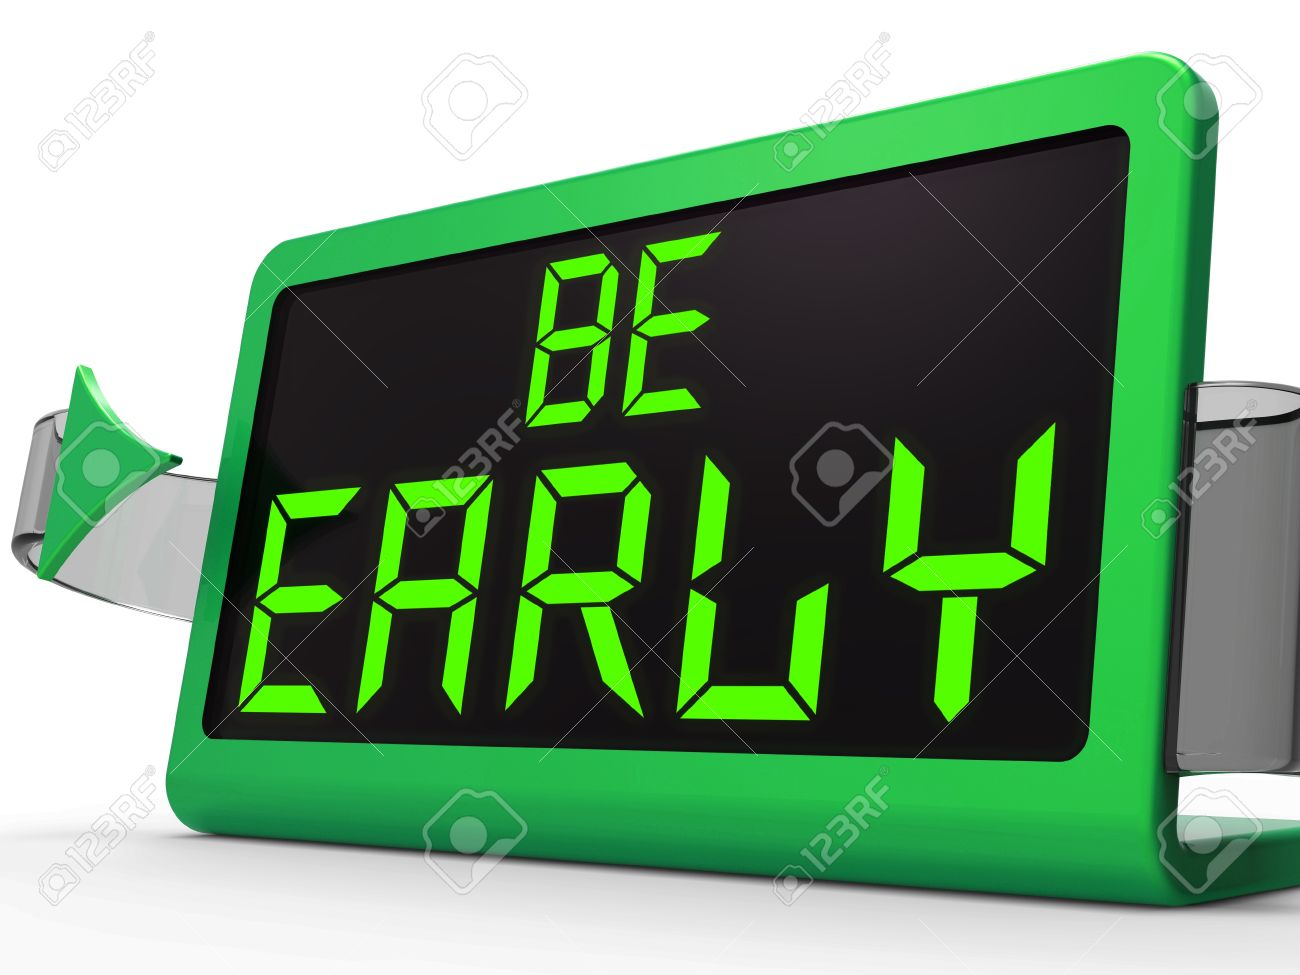 Be eArly Clock.jpg